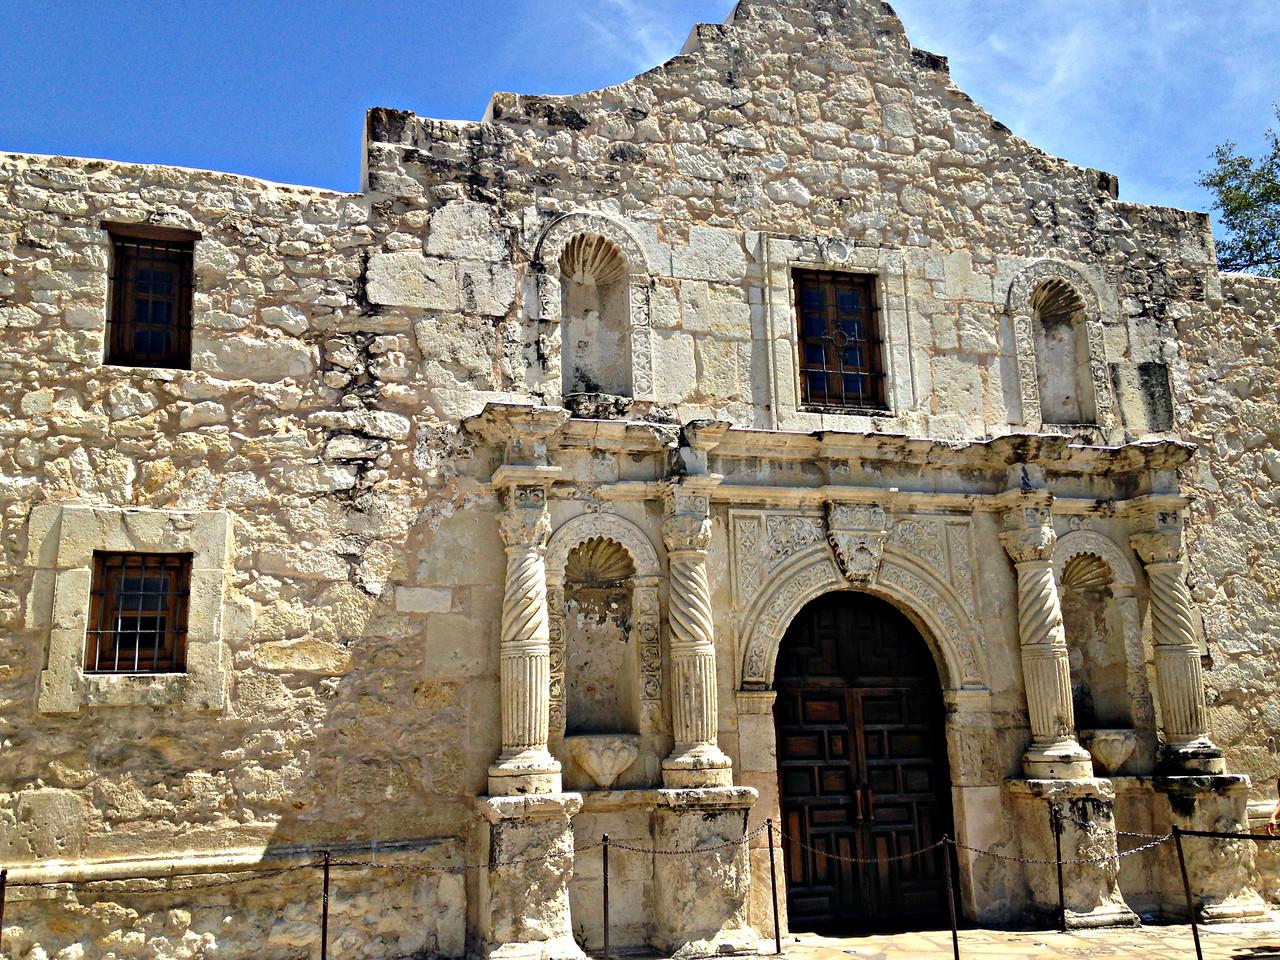 More Alamo